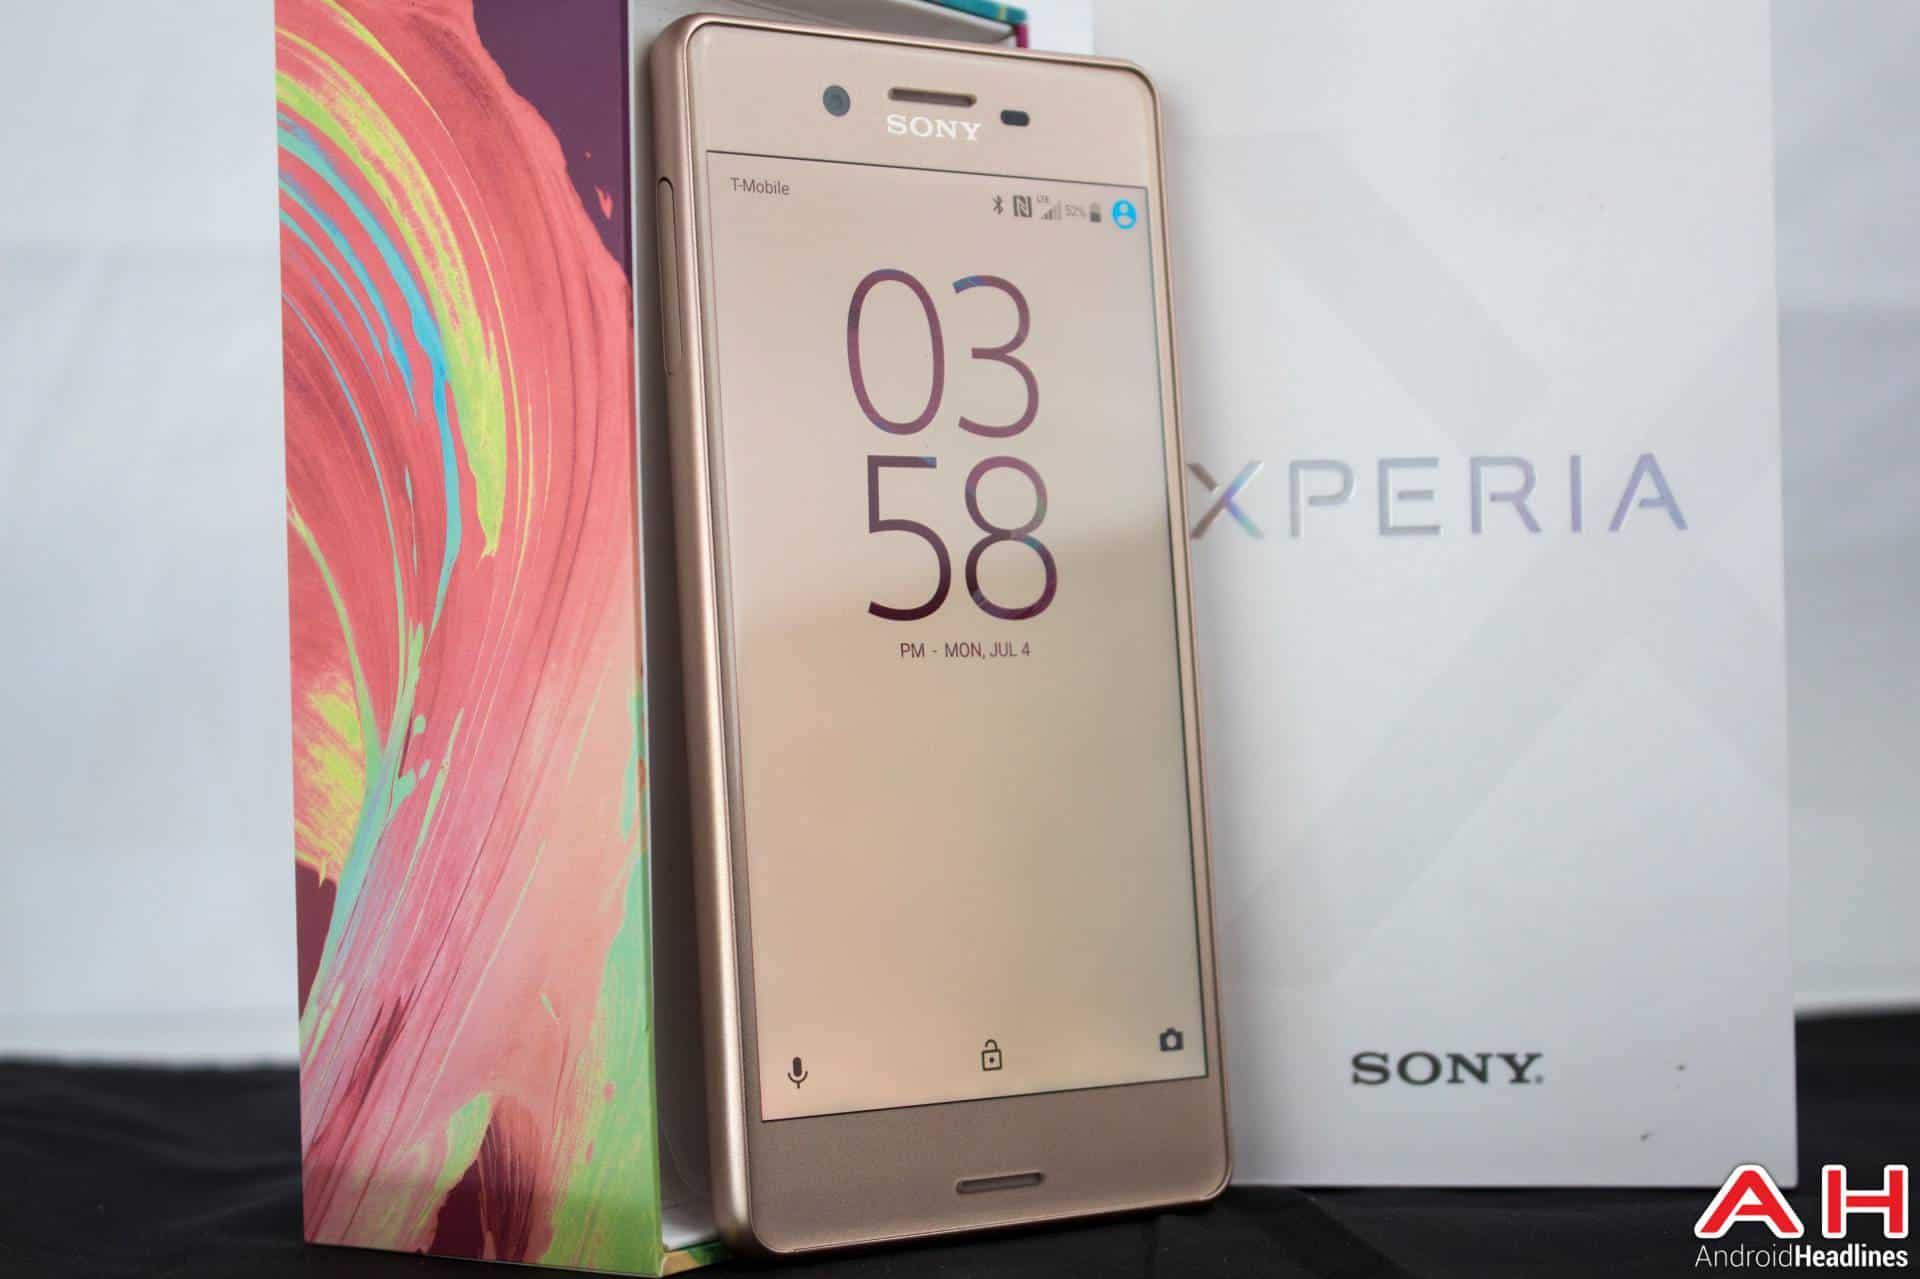 Sony-Xperia-X-Performance-AH-NS-box